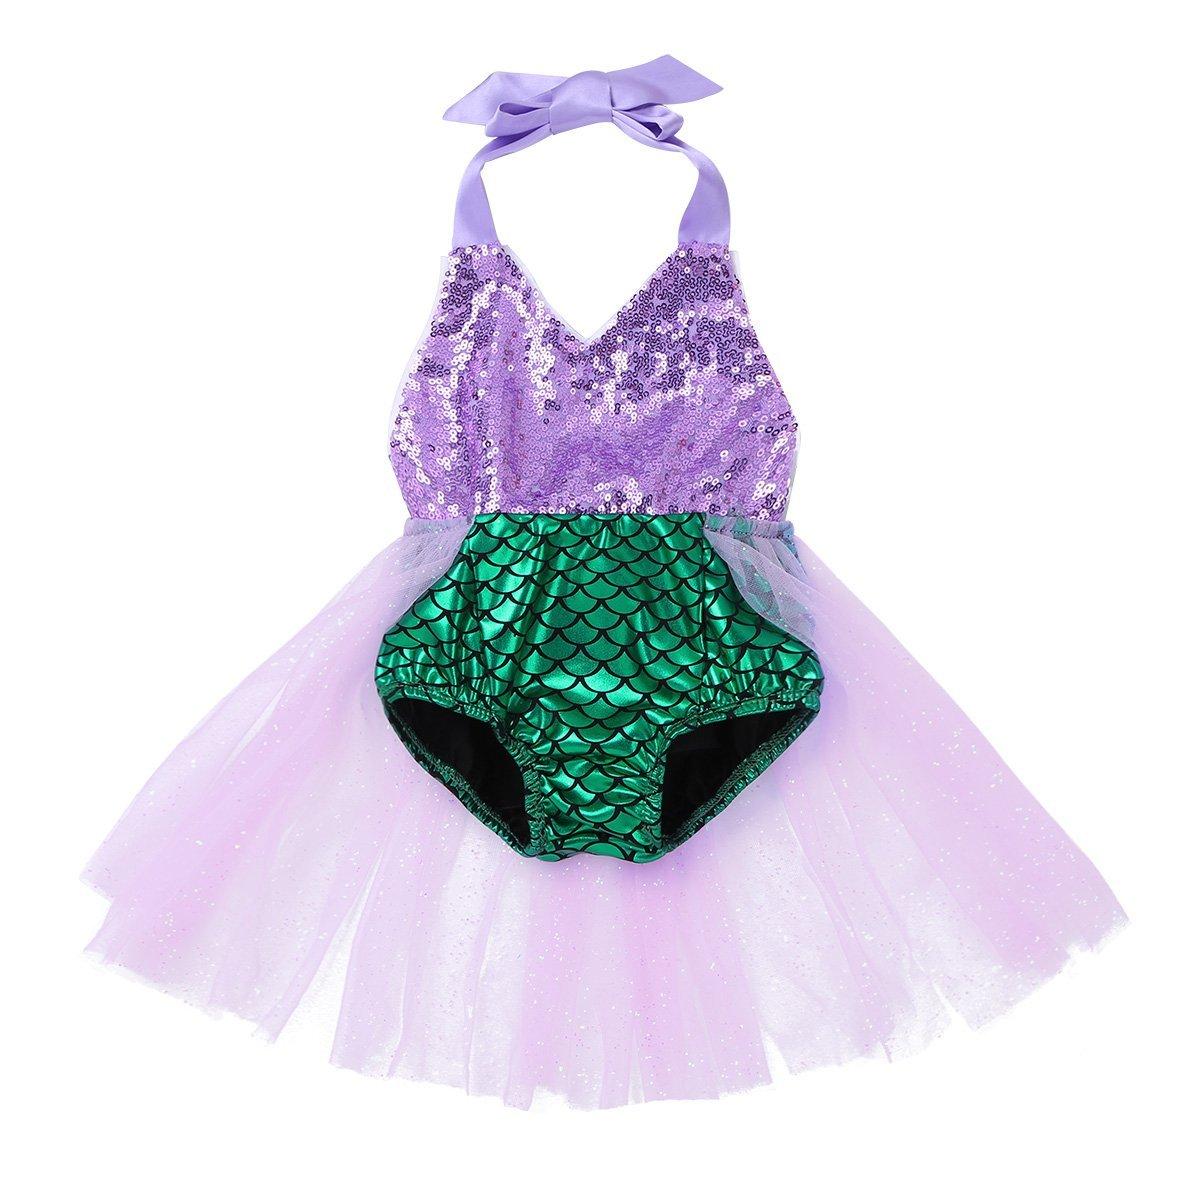 FEESHOW Toddler Baby Girls Mermaid Princess Bikini Swimsuit Halter Romper Tutu Fancy Dress Costumes Green 9-12 Months